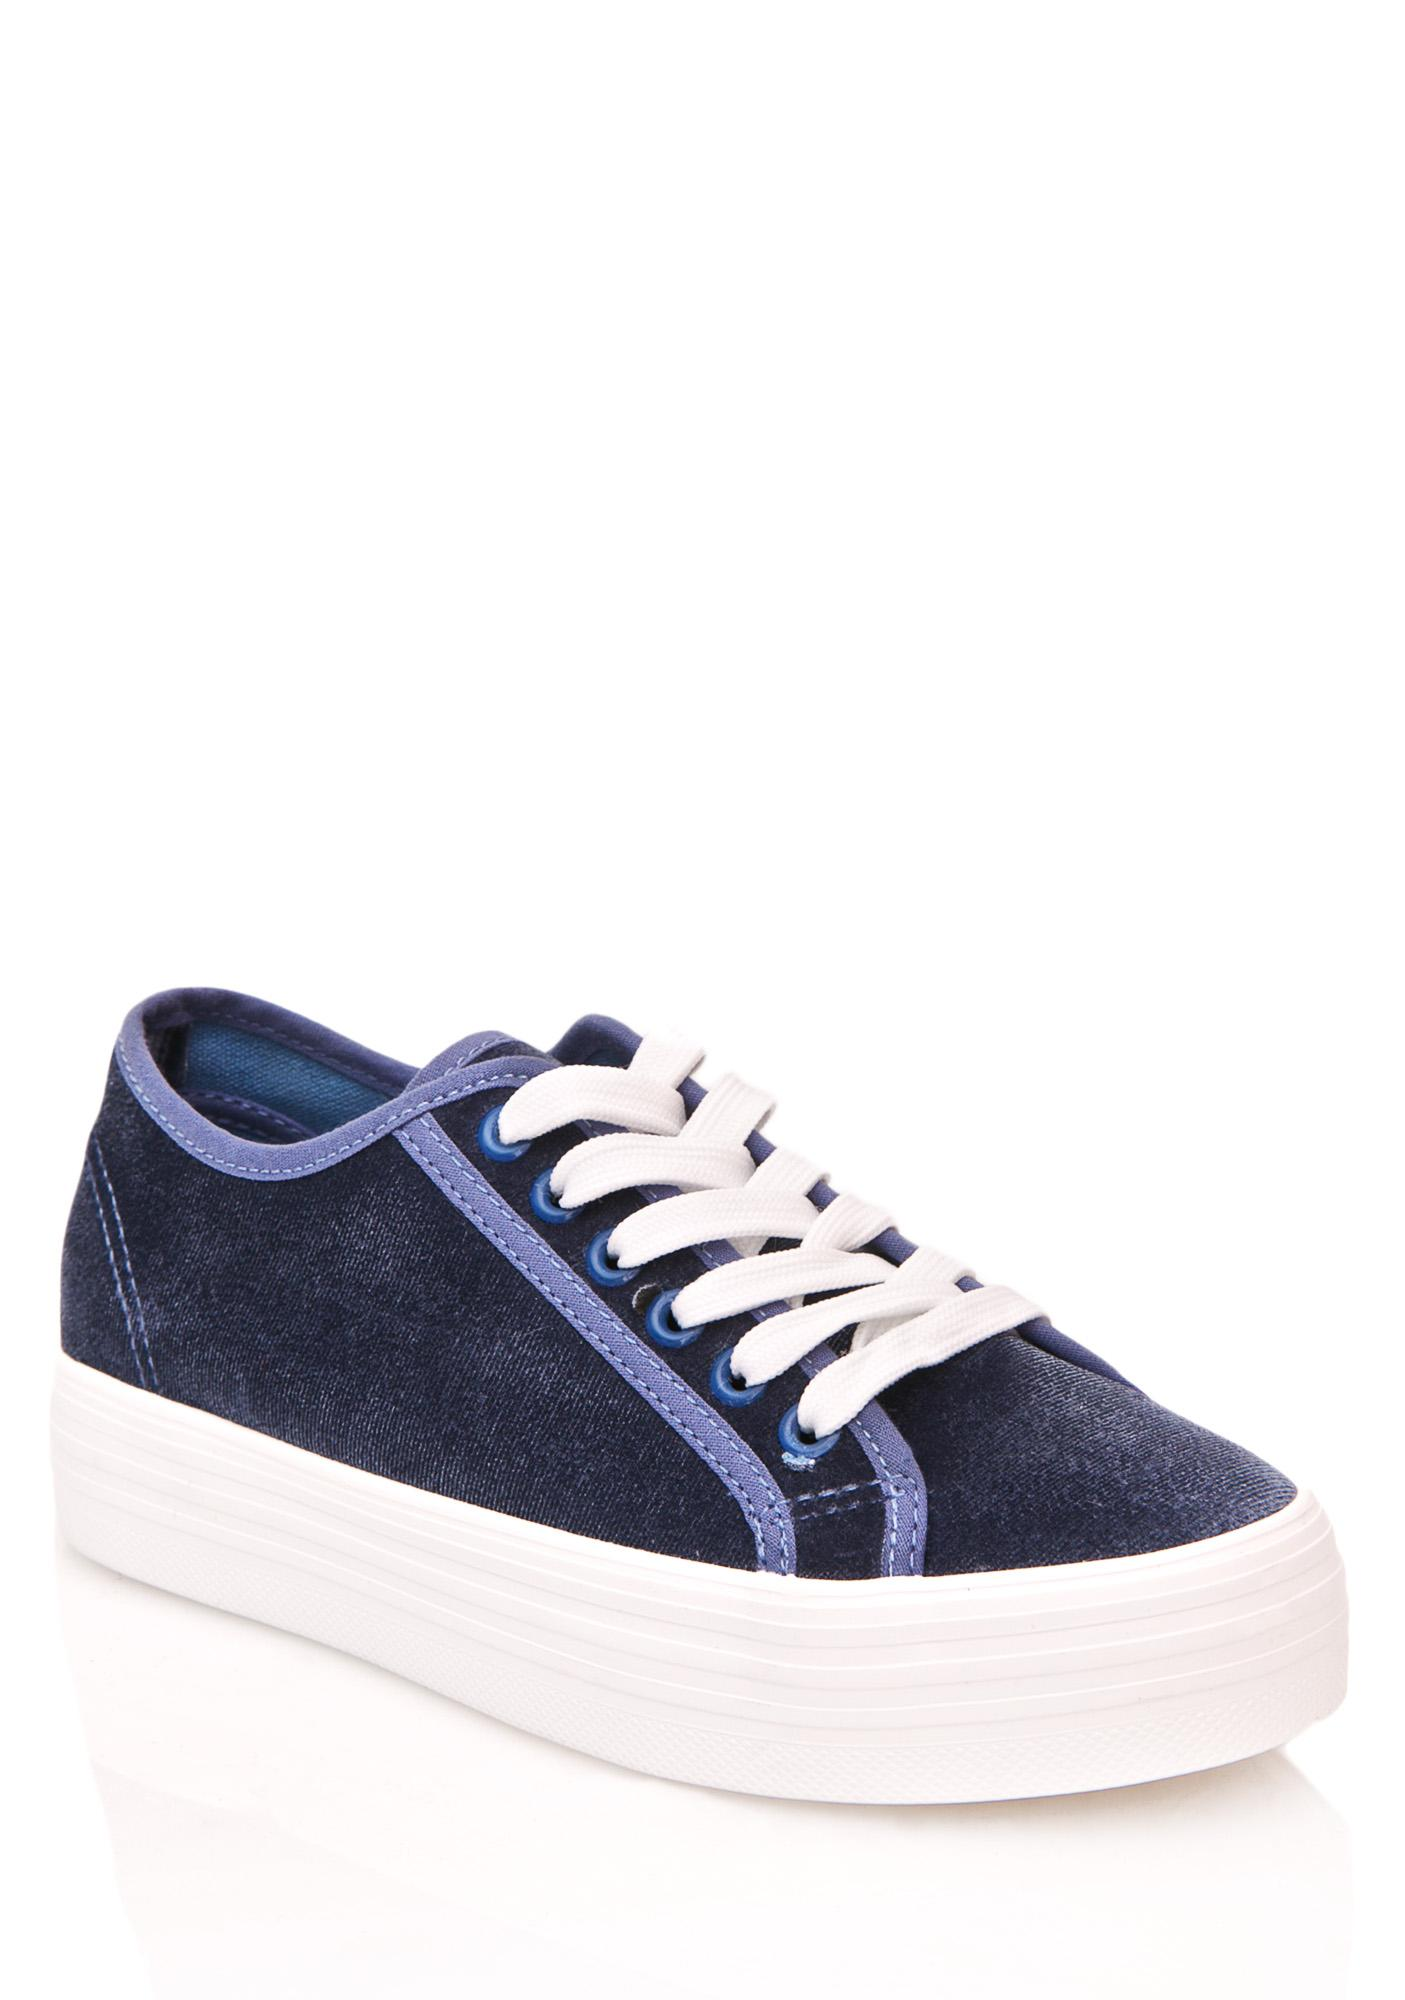 Another Level Velvet Sneakers